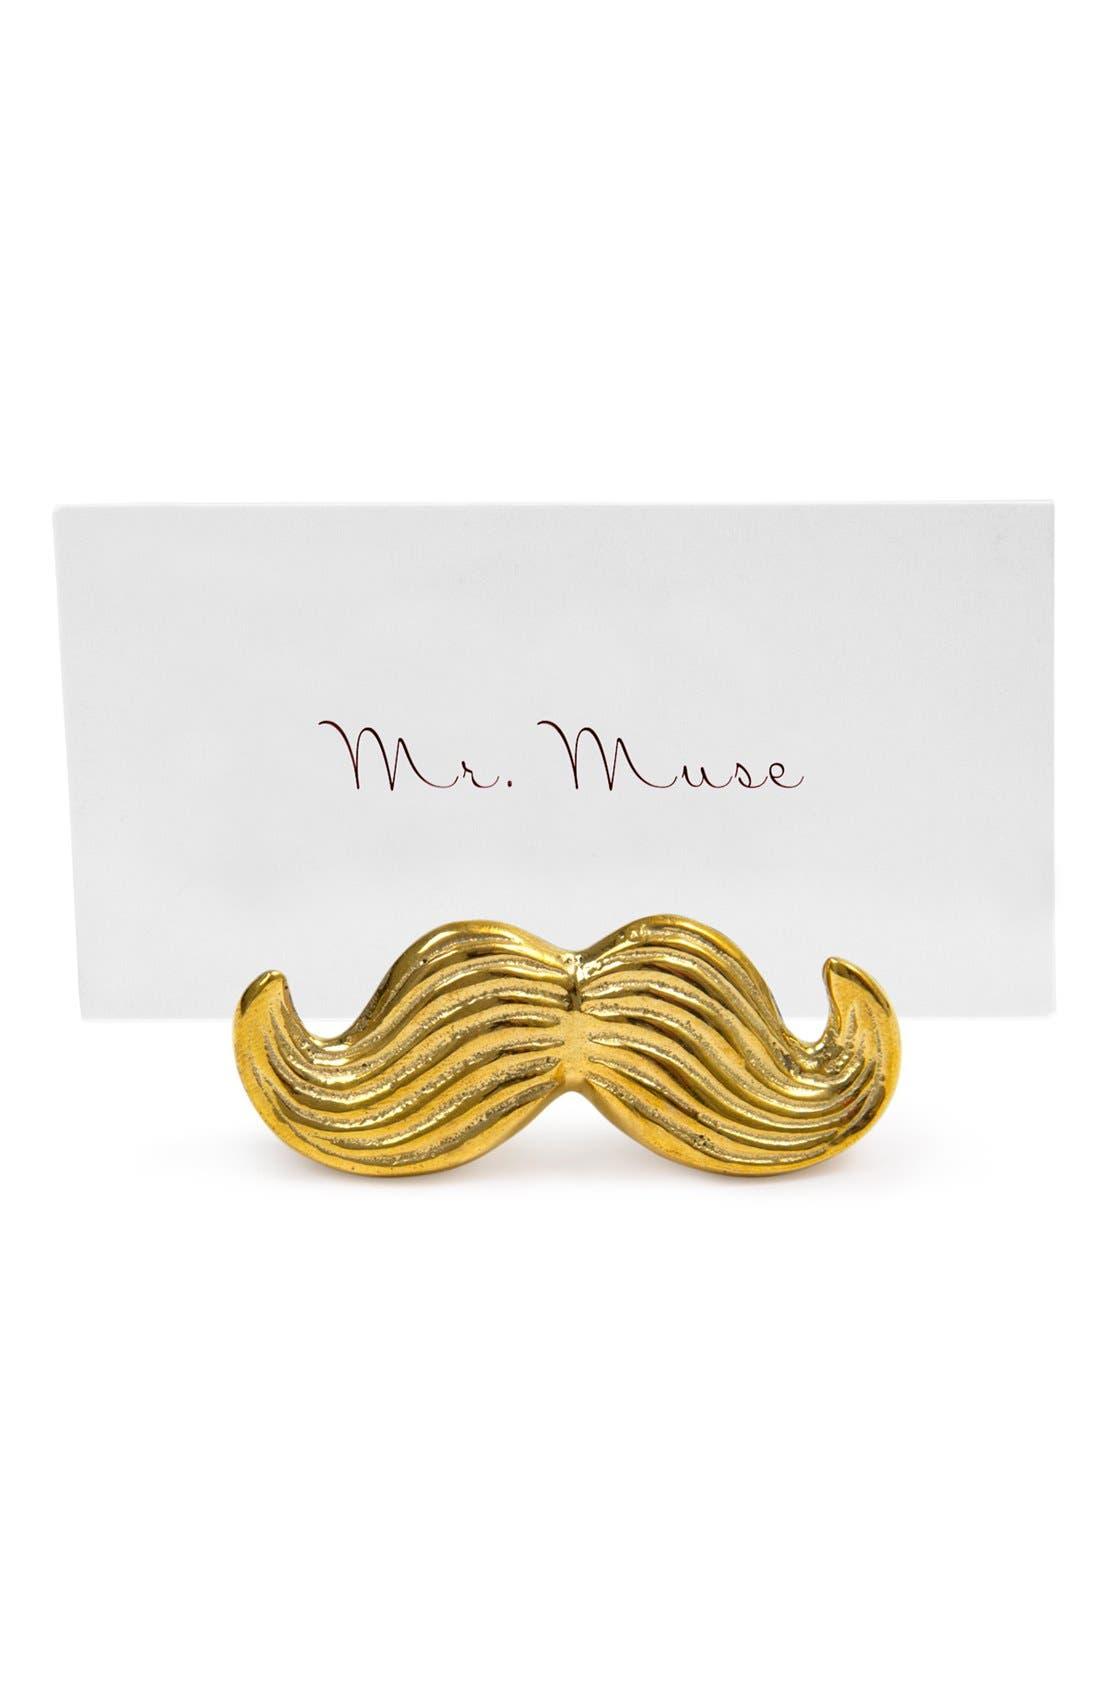 Alternate Image 3  - Jonathan Adler 'Mr. & Mrs. Muse' Brass Place Card Holders (Set of 4)